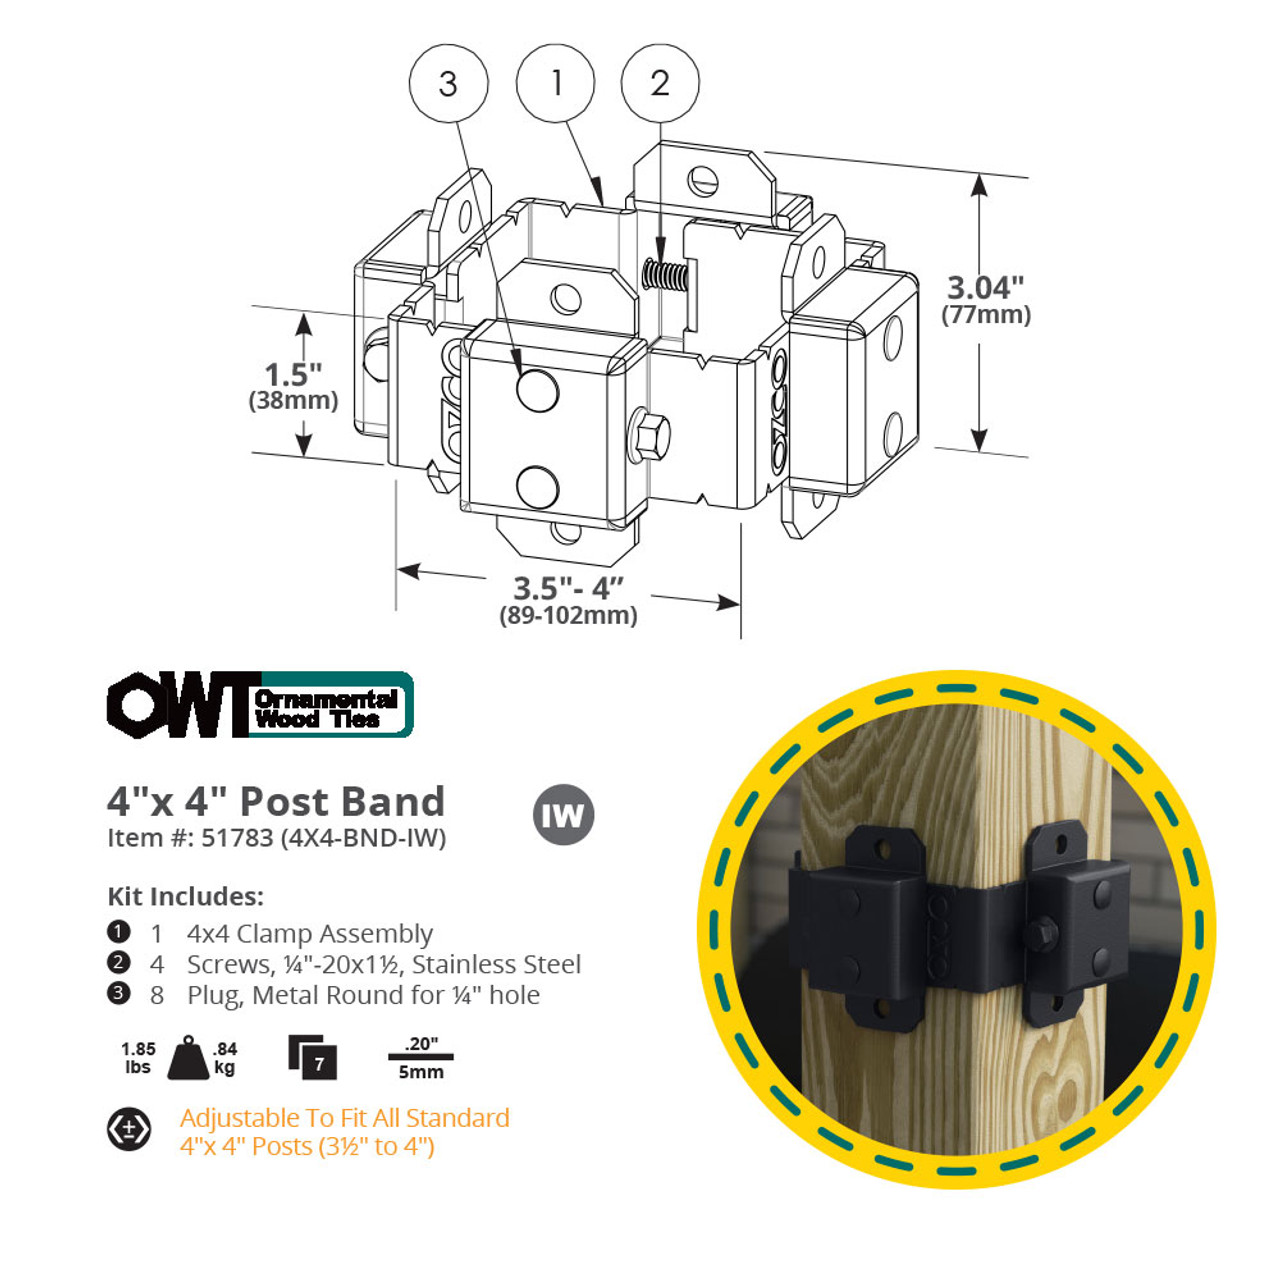 4 x 4 OZCO OWT Ironwood Post Band Spec Drawing